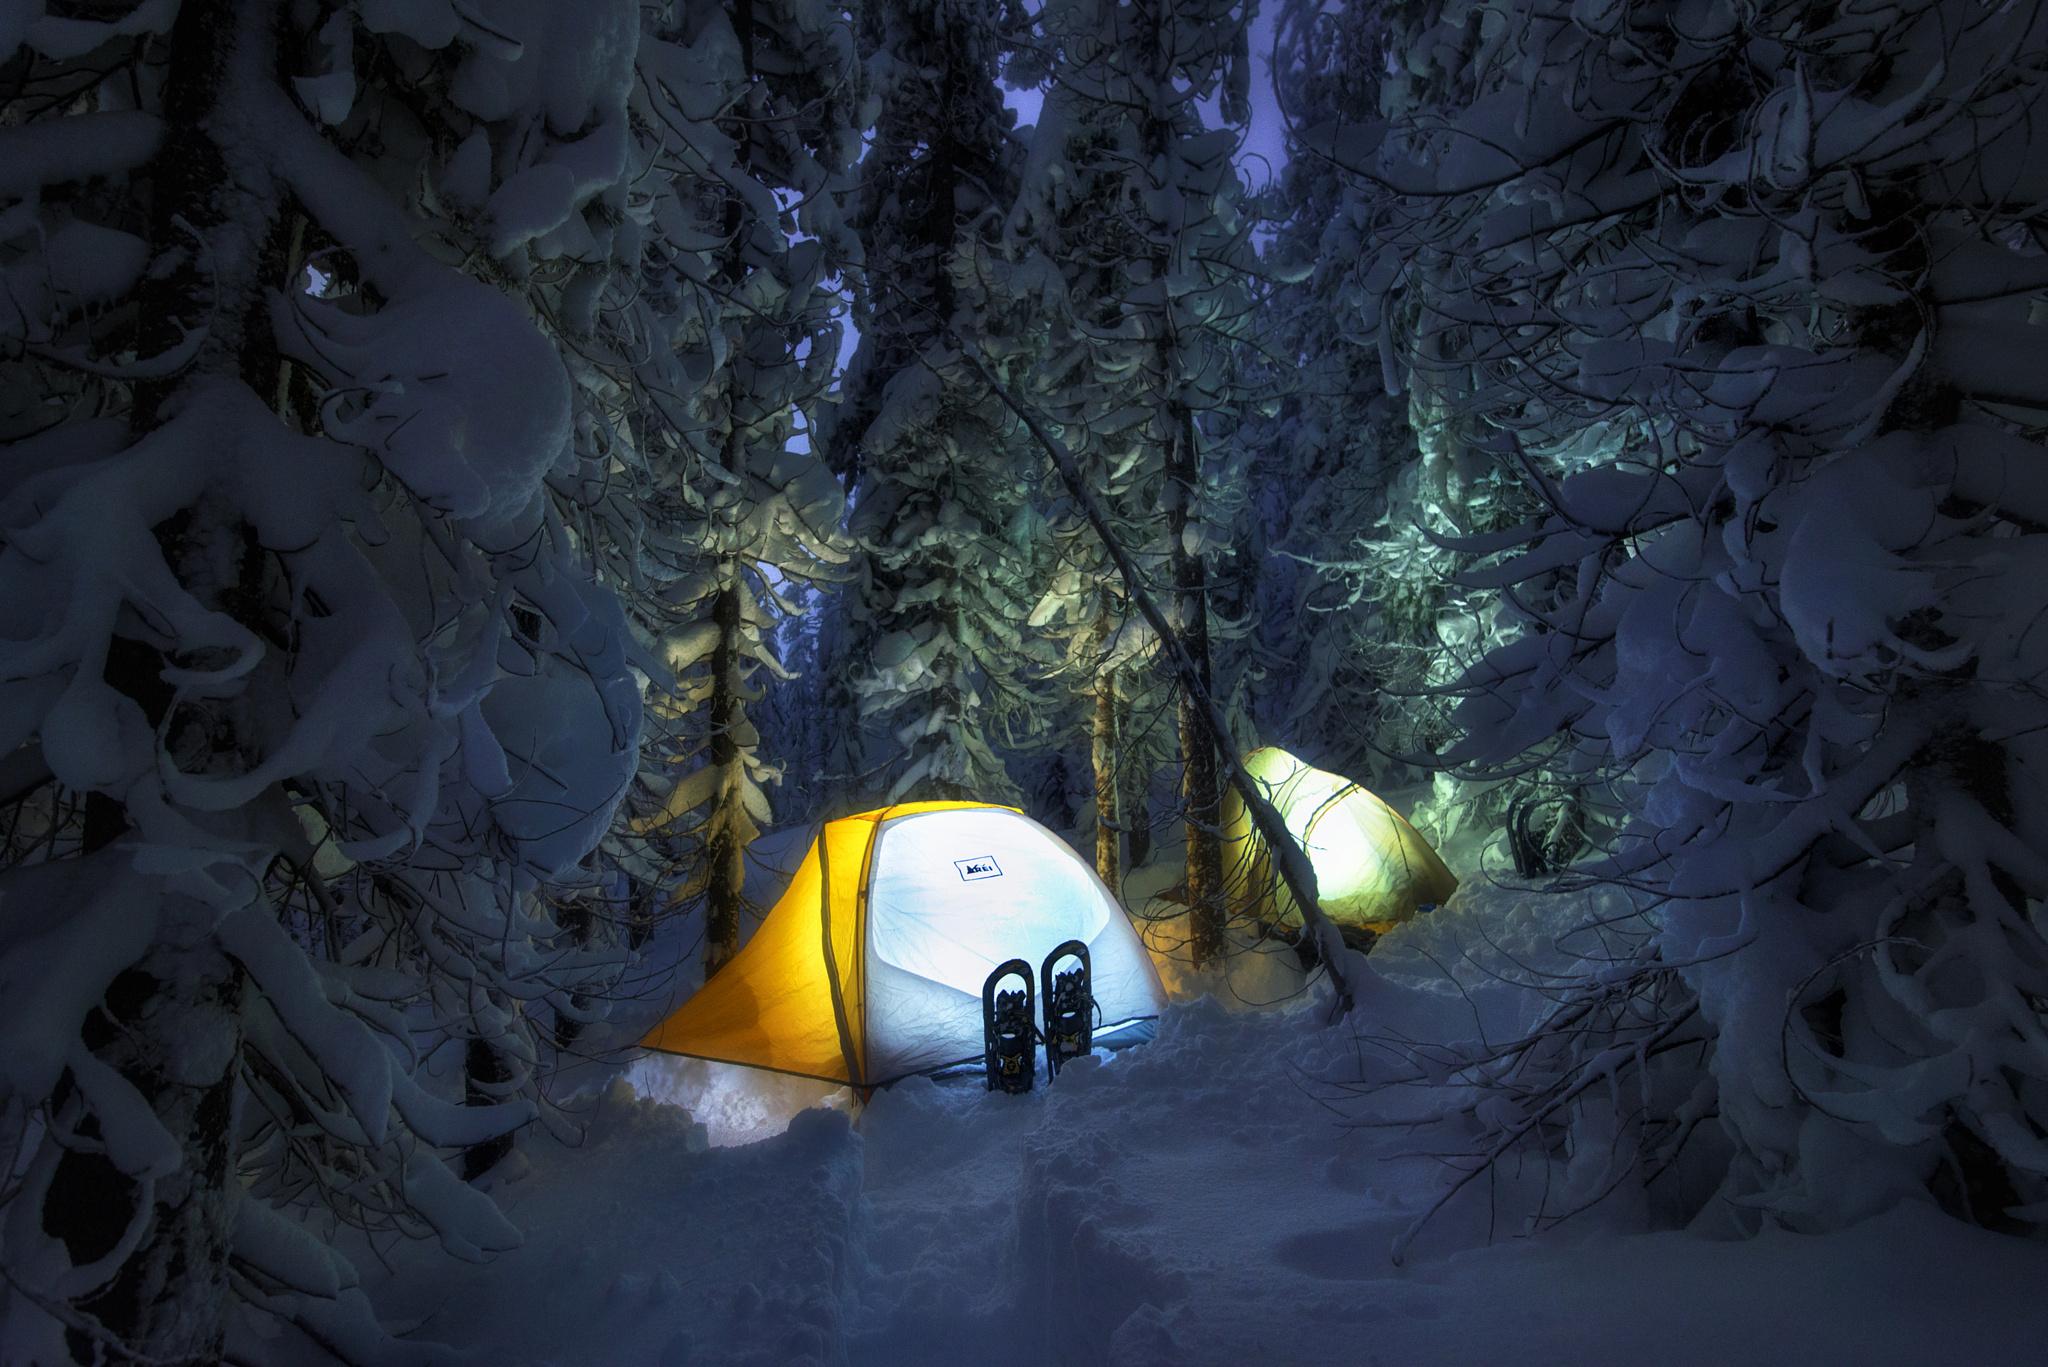 camping-wallpaper-14